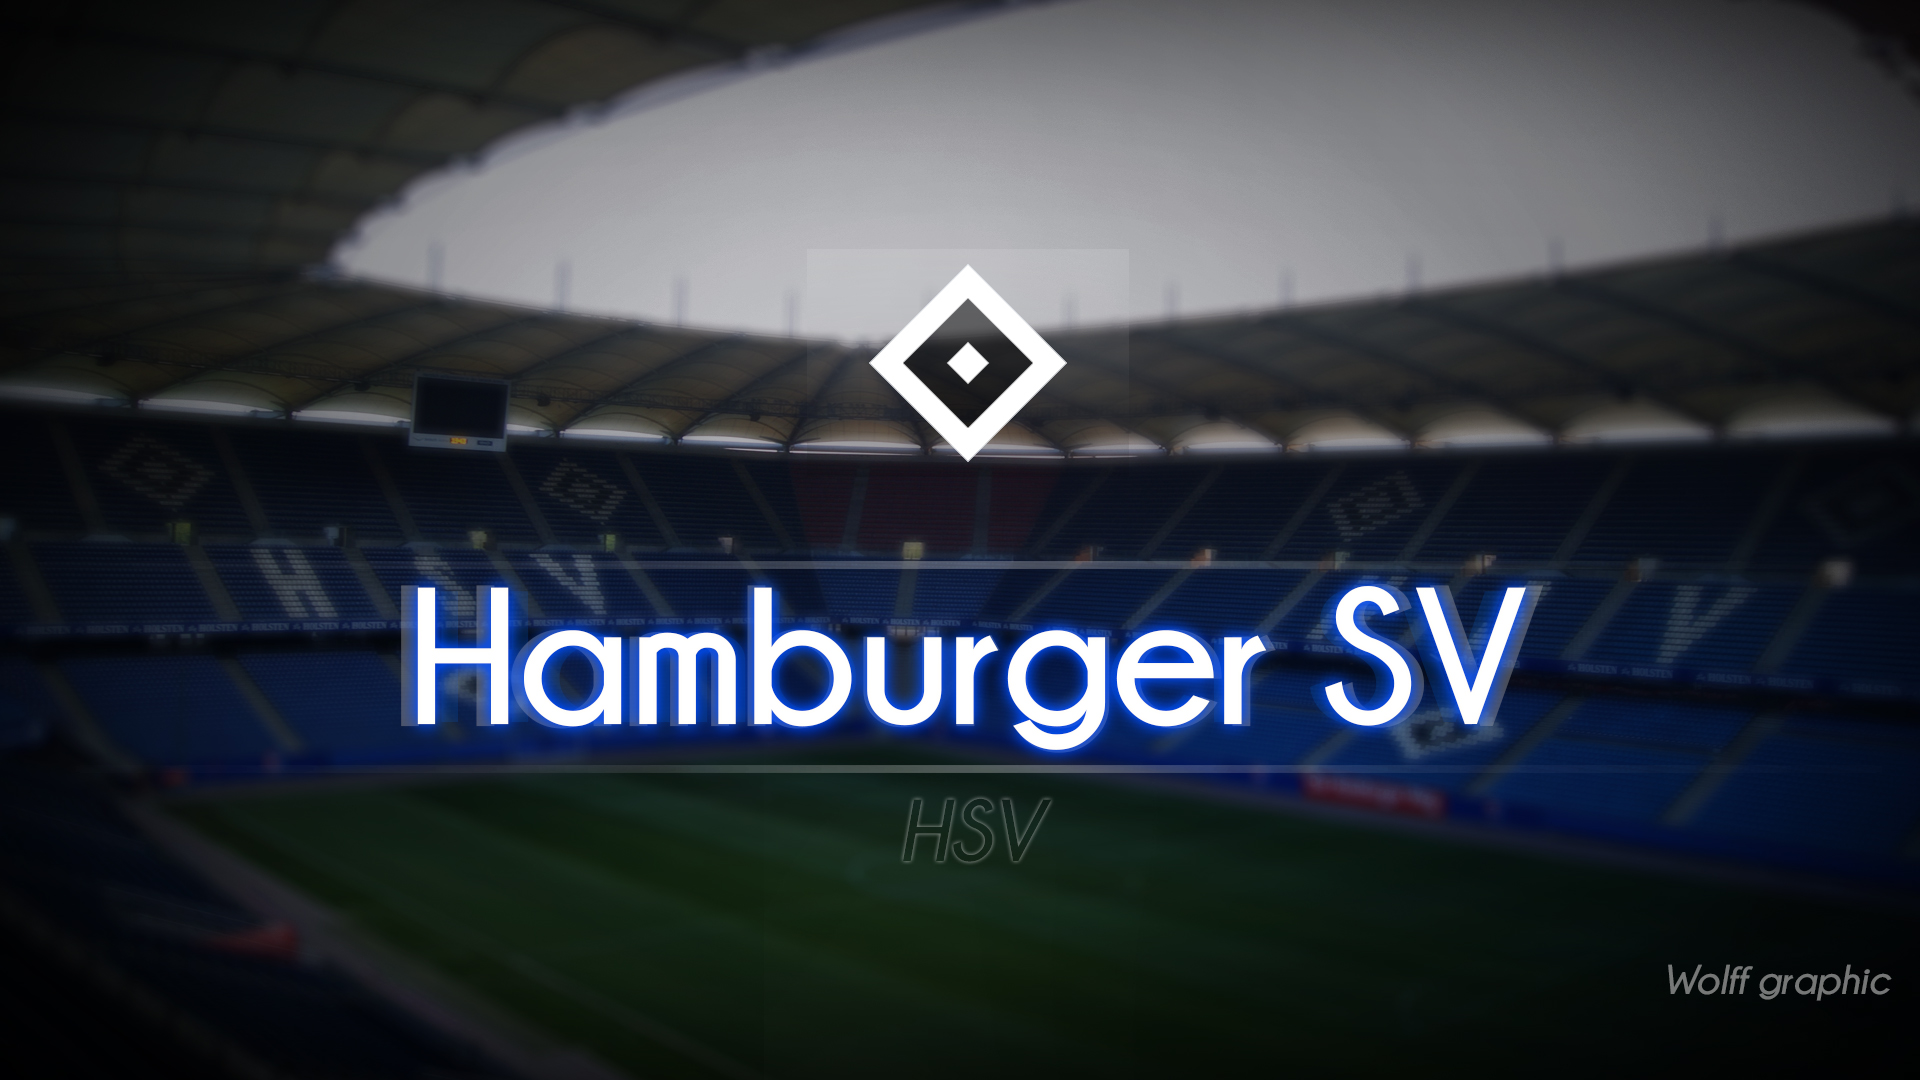 Hamburger SV wallpaper, Football Pictures and Photos